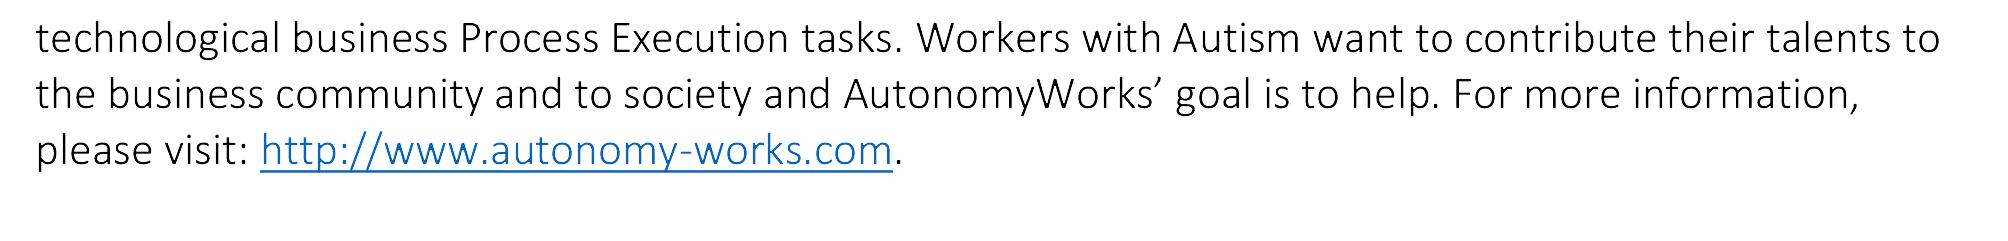 2015 02 03 Centro-AutonomyWorks_Release_Copy2